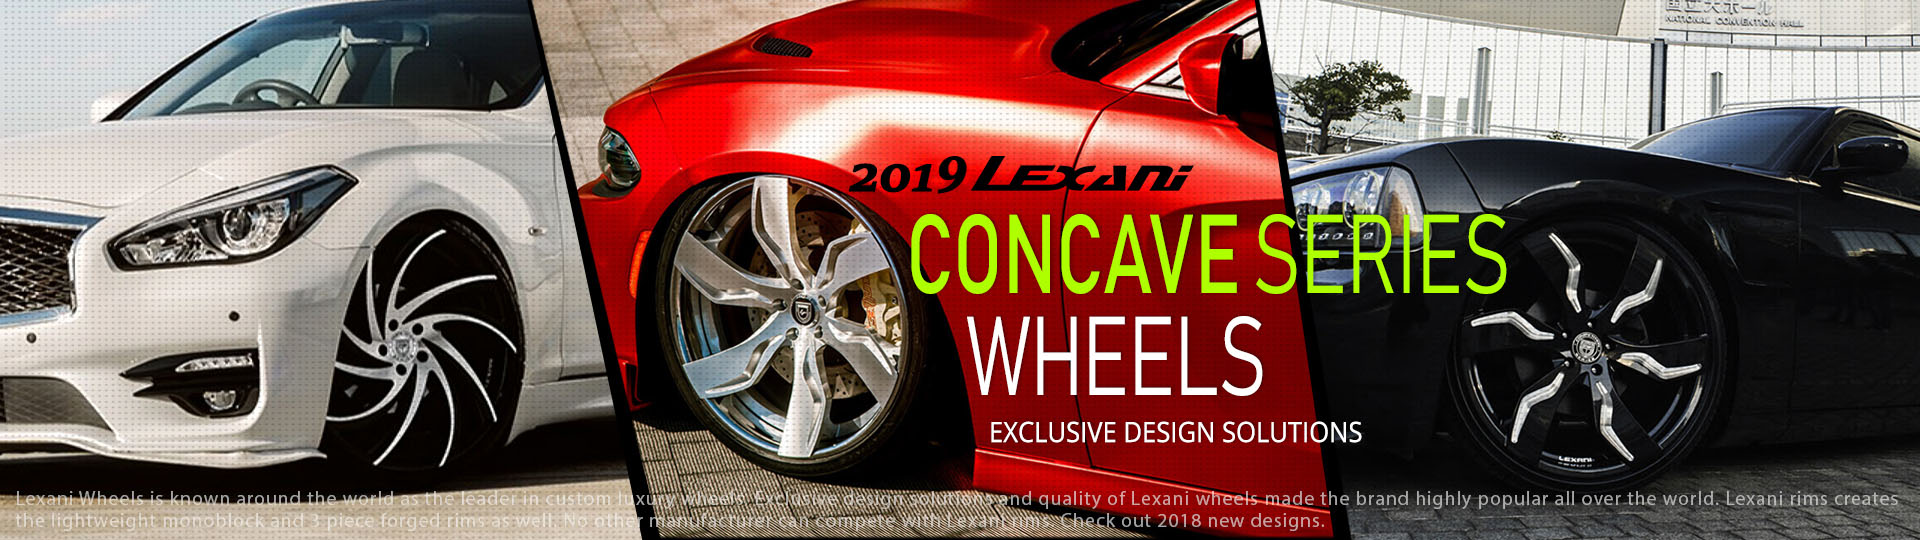 Rims Online After Market Wheels Deals Car Truck Wheels Tires